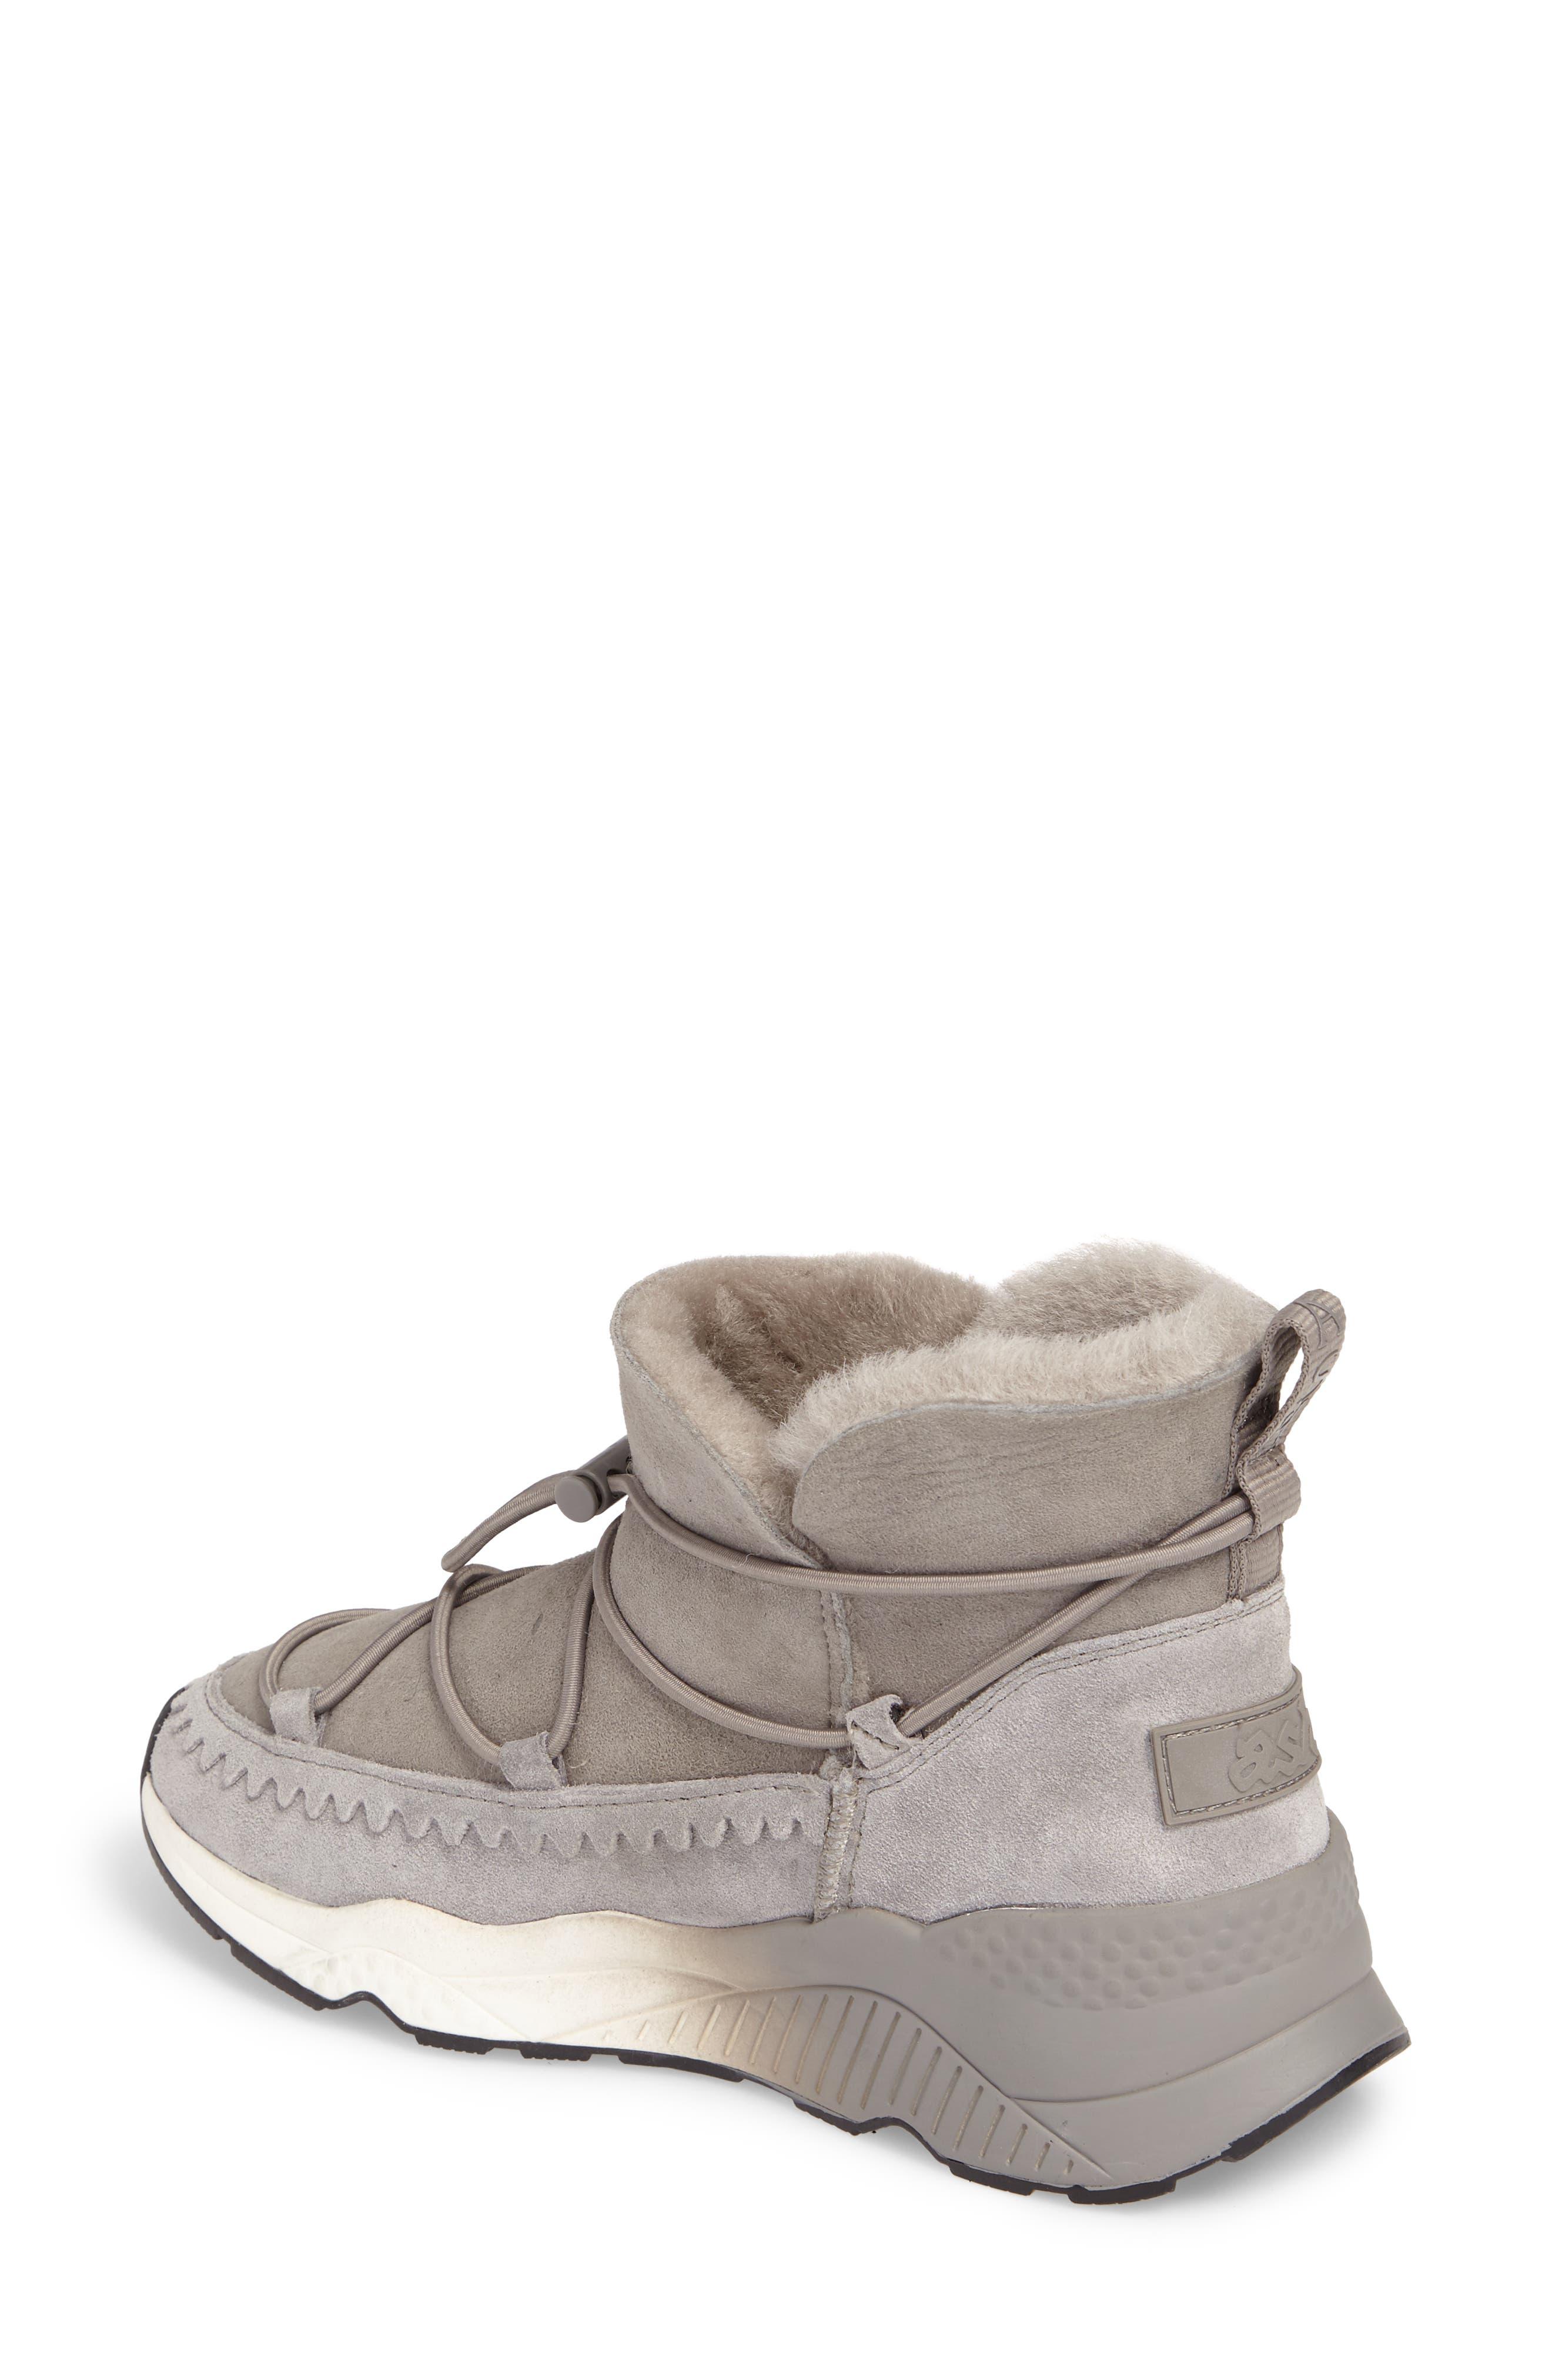 Mitsouko Genuine Shearling Sneaker,                             Alternate thumbnail 2, color,